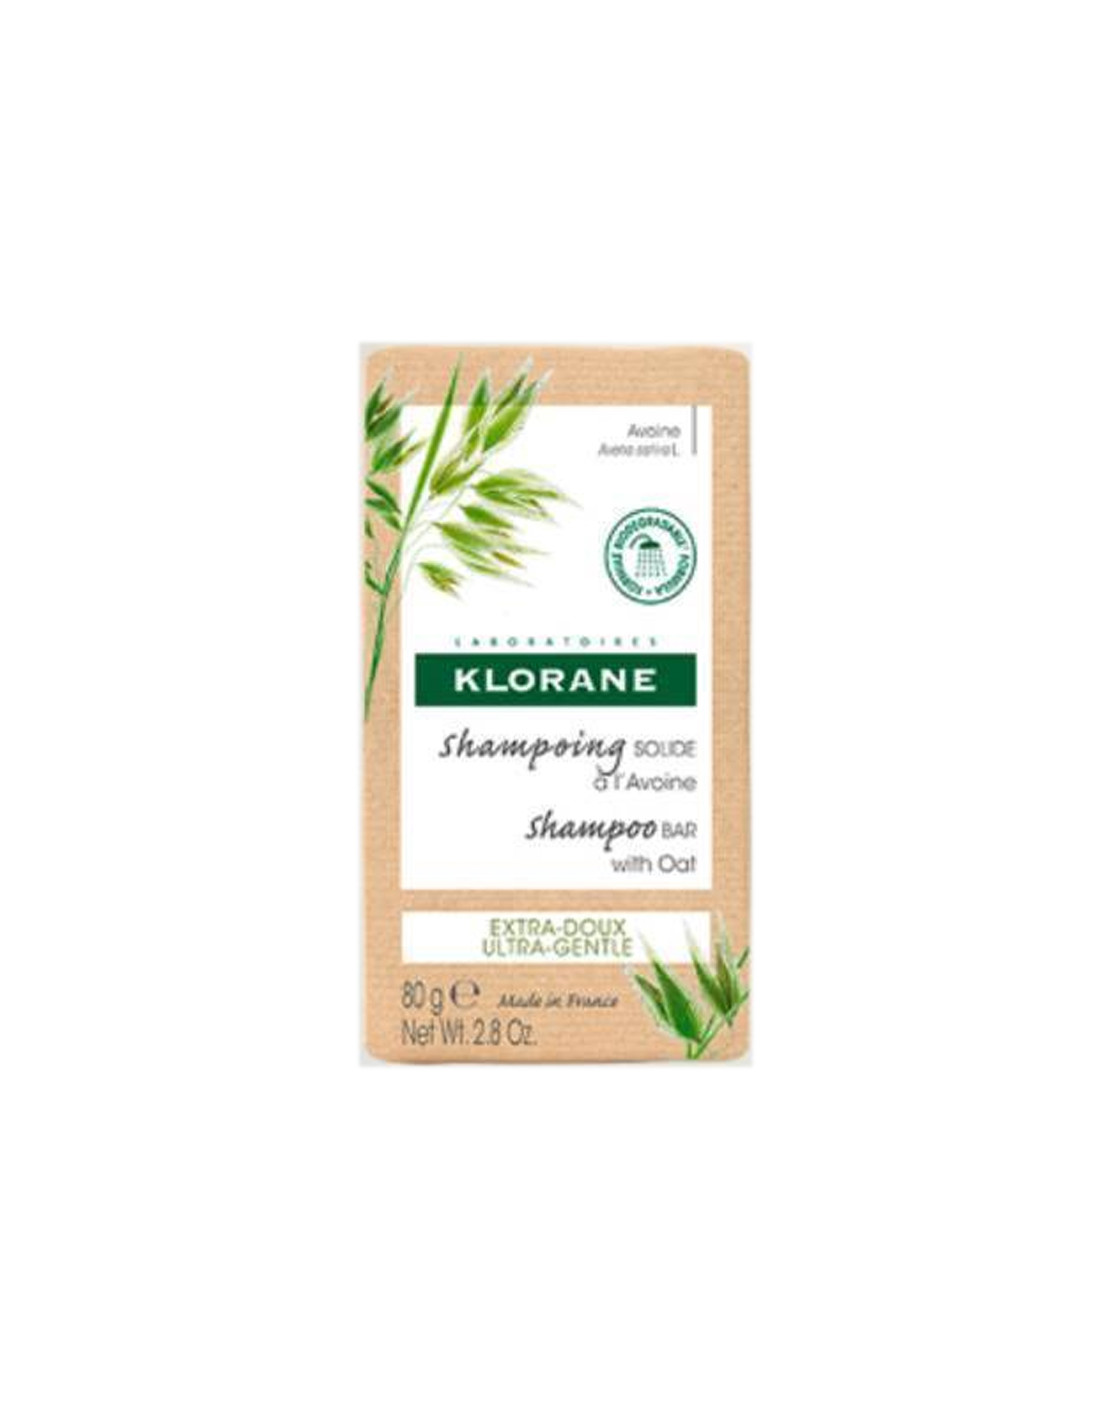 Klorane Shampoo Solido All'Avena 80 g